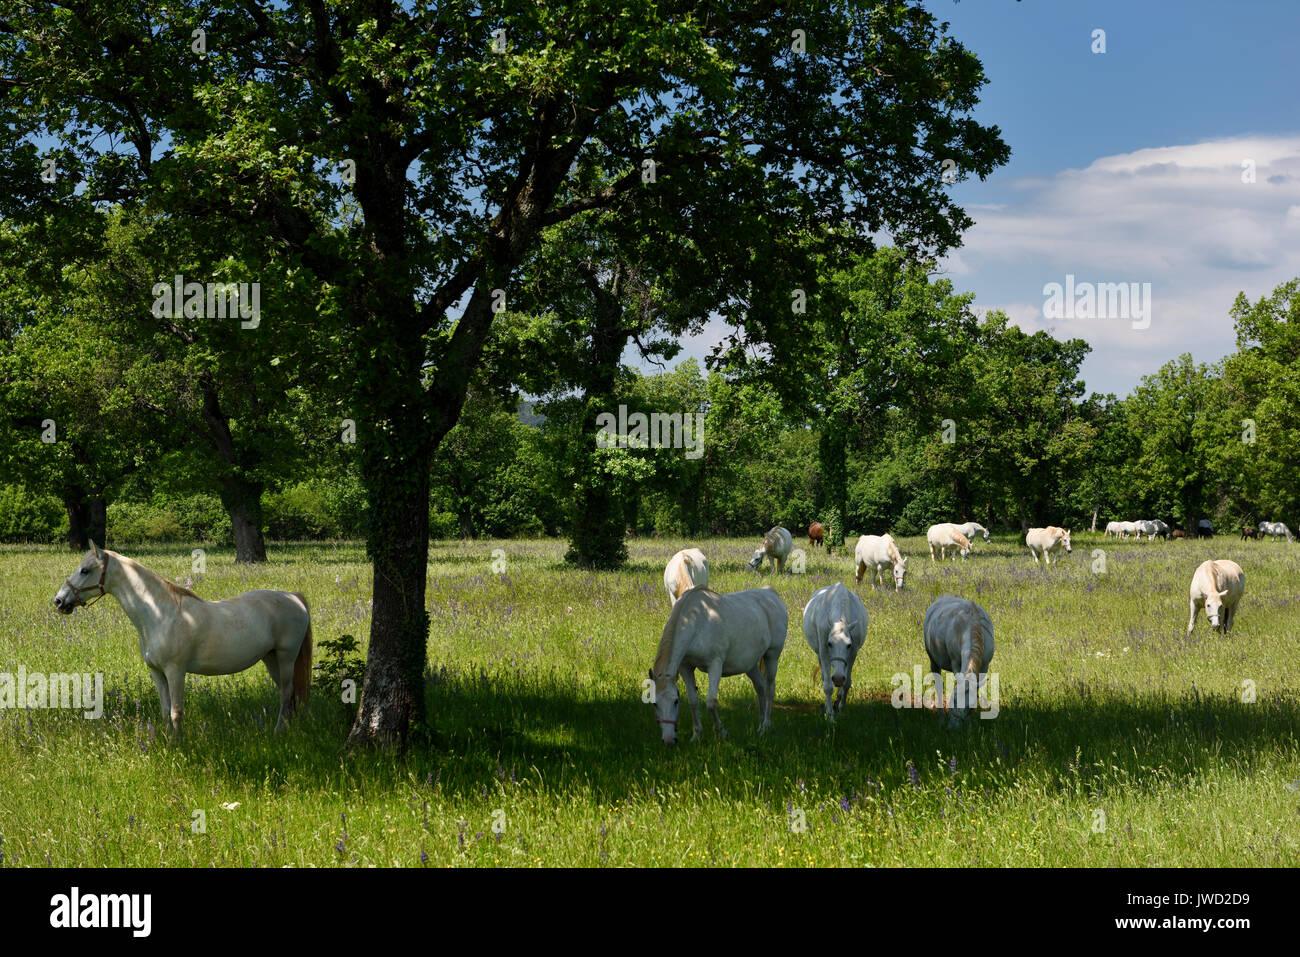 Herd of white Lipizzaner horses grazing in a grassy meadow at the Lipica Stud Farm at Lipica Sezana Slovenia - Stock Image